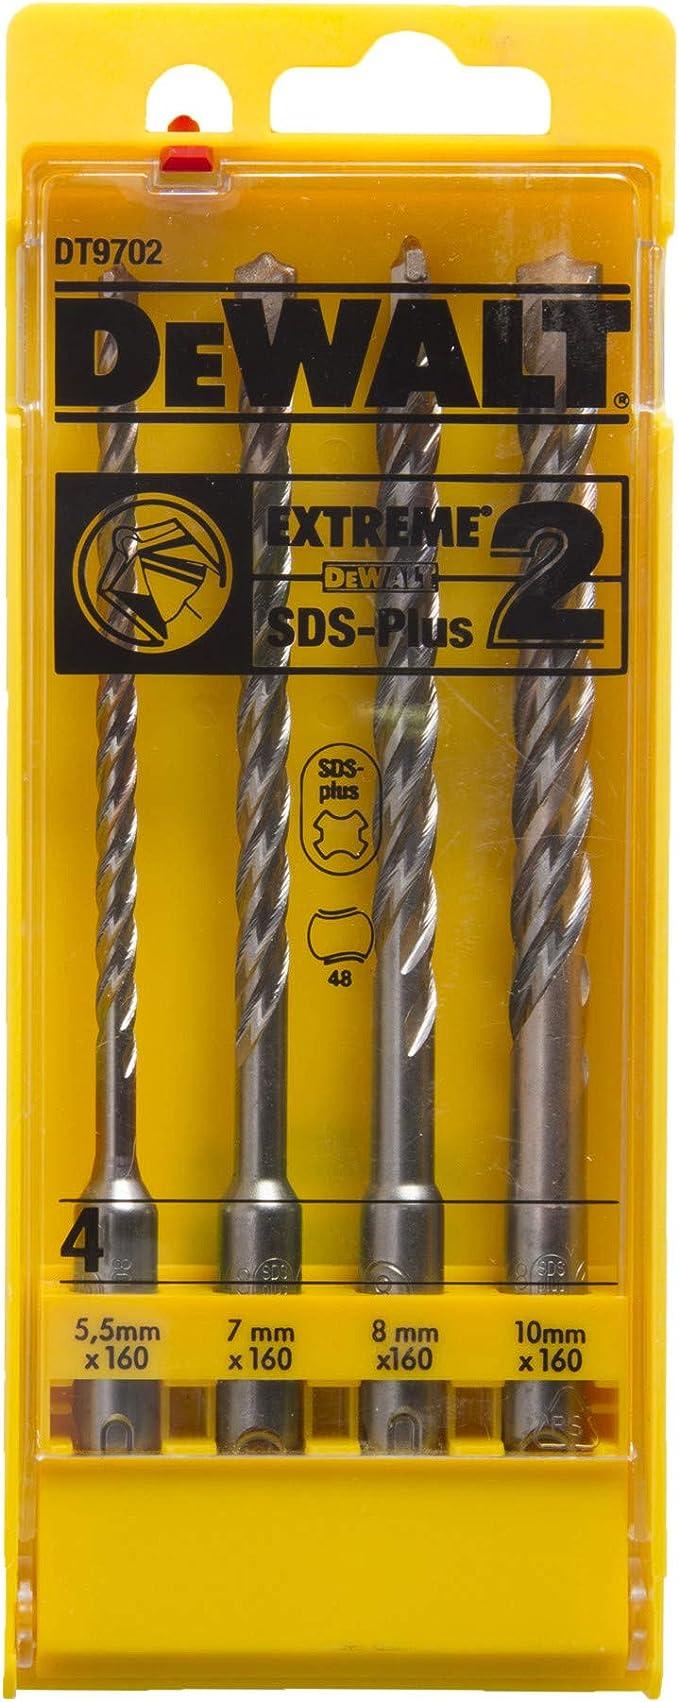 9mm x 160mm DT9536-QZ Dewalt Extreme SDS PlusDrillBit